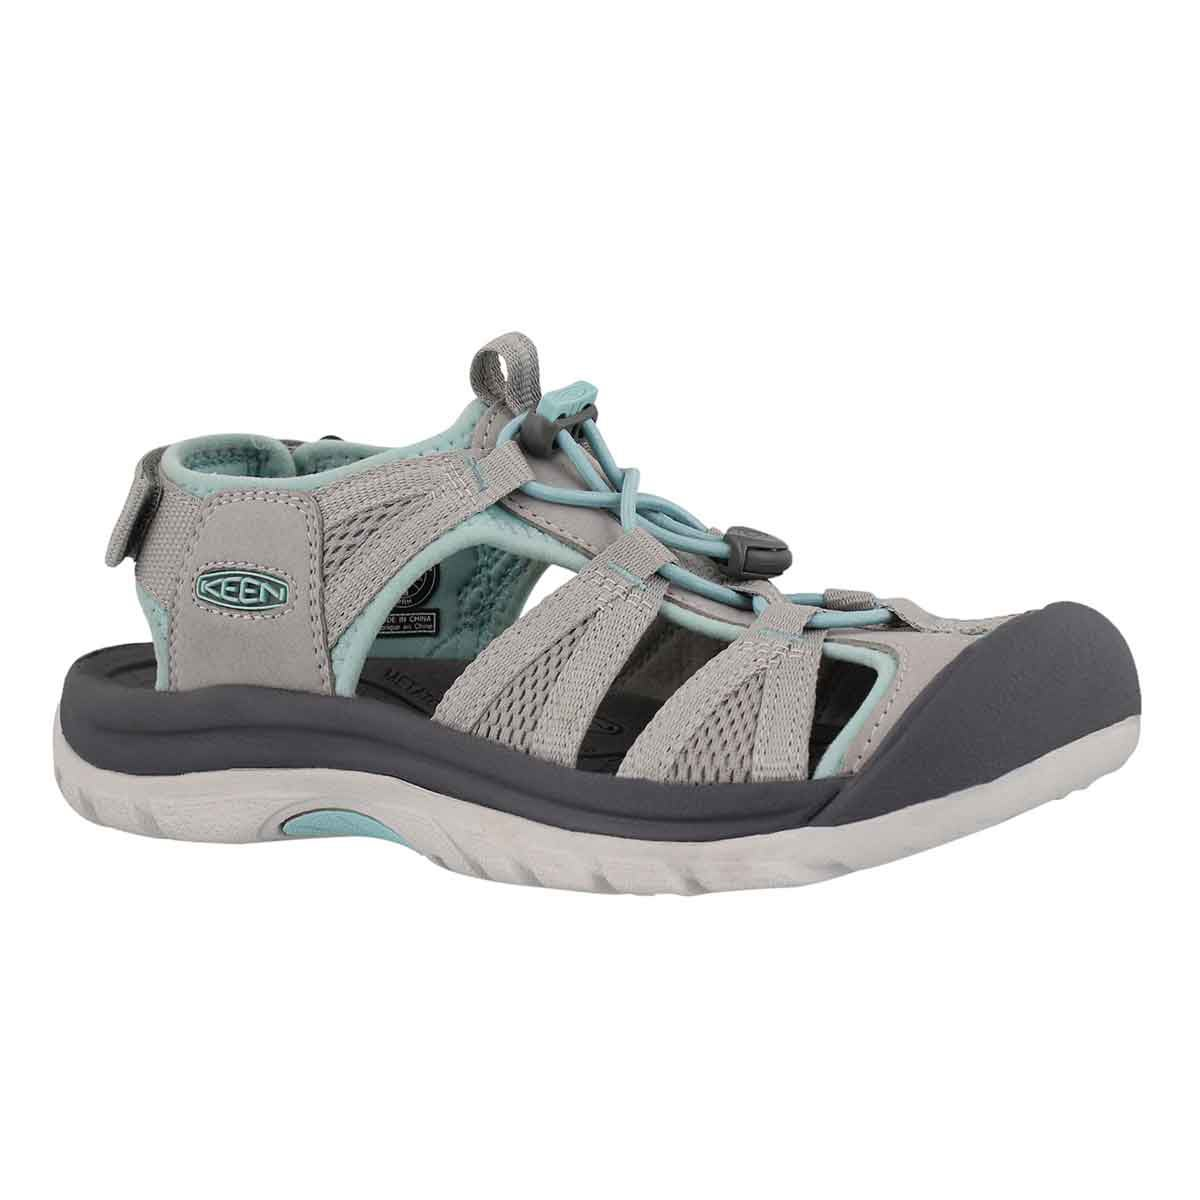 Women's VENICE II H2  paloma/trq sport sandals